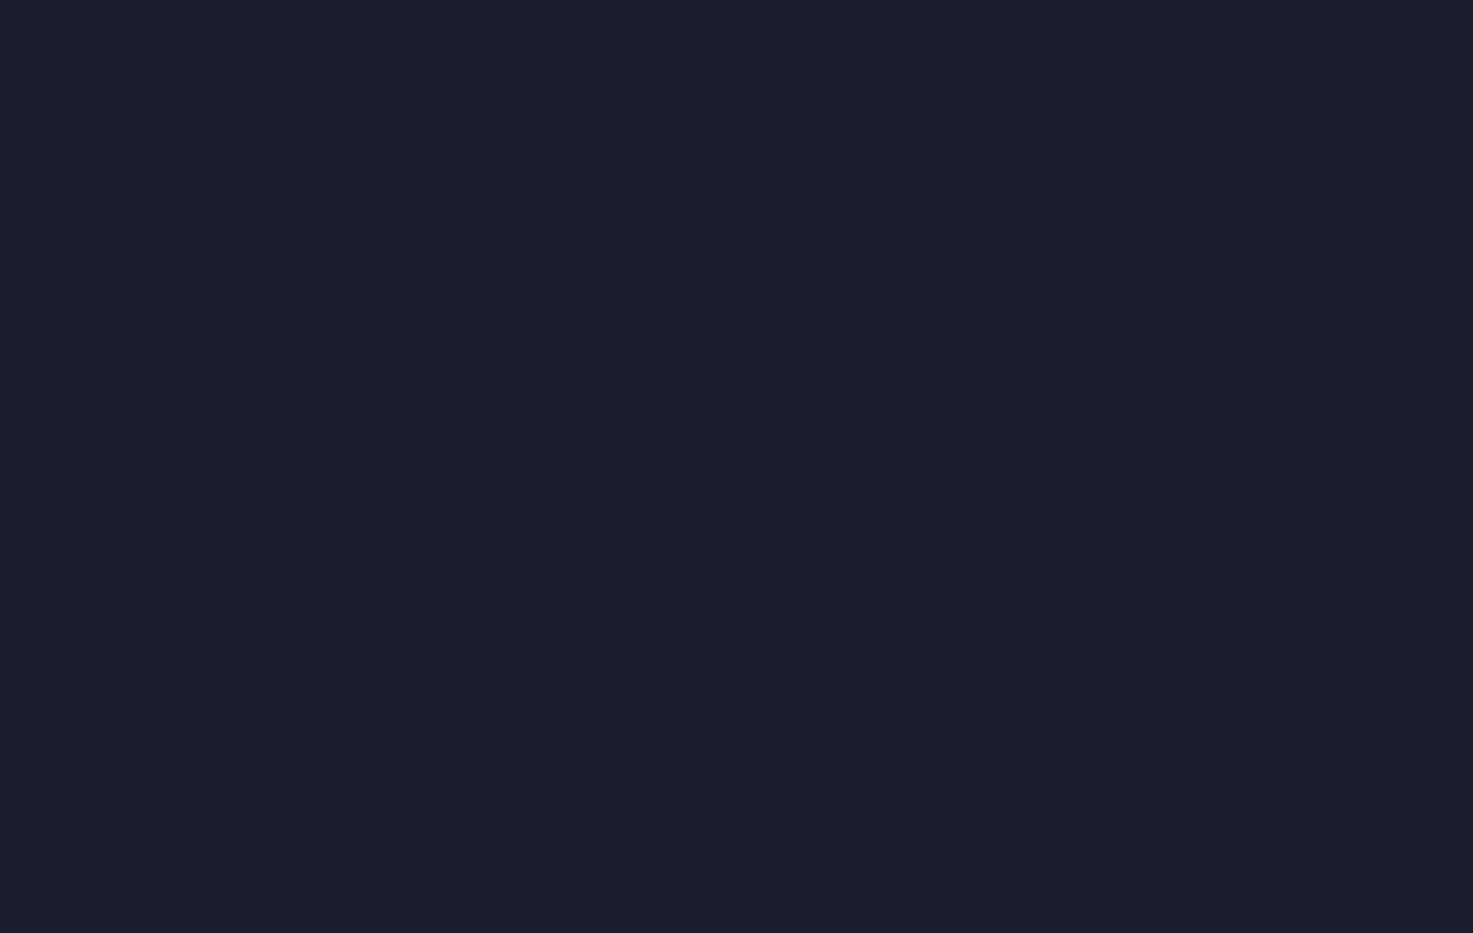 blu mare 058